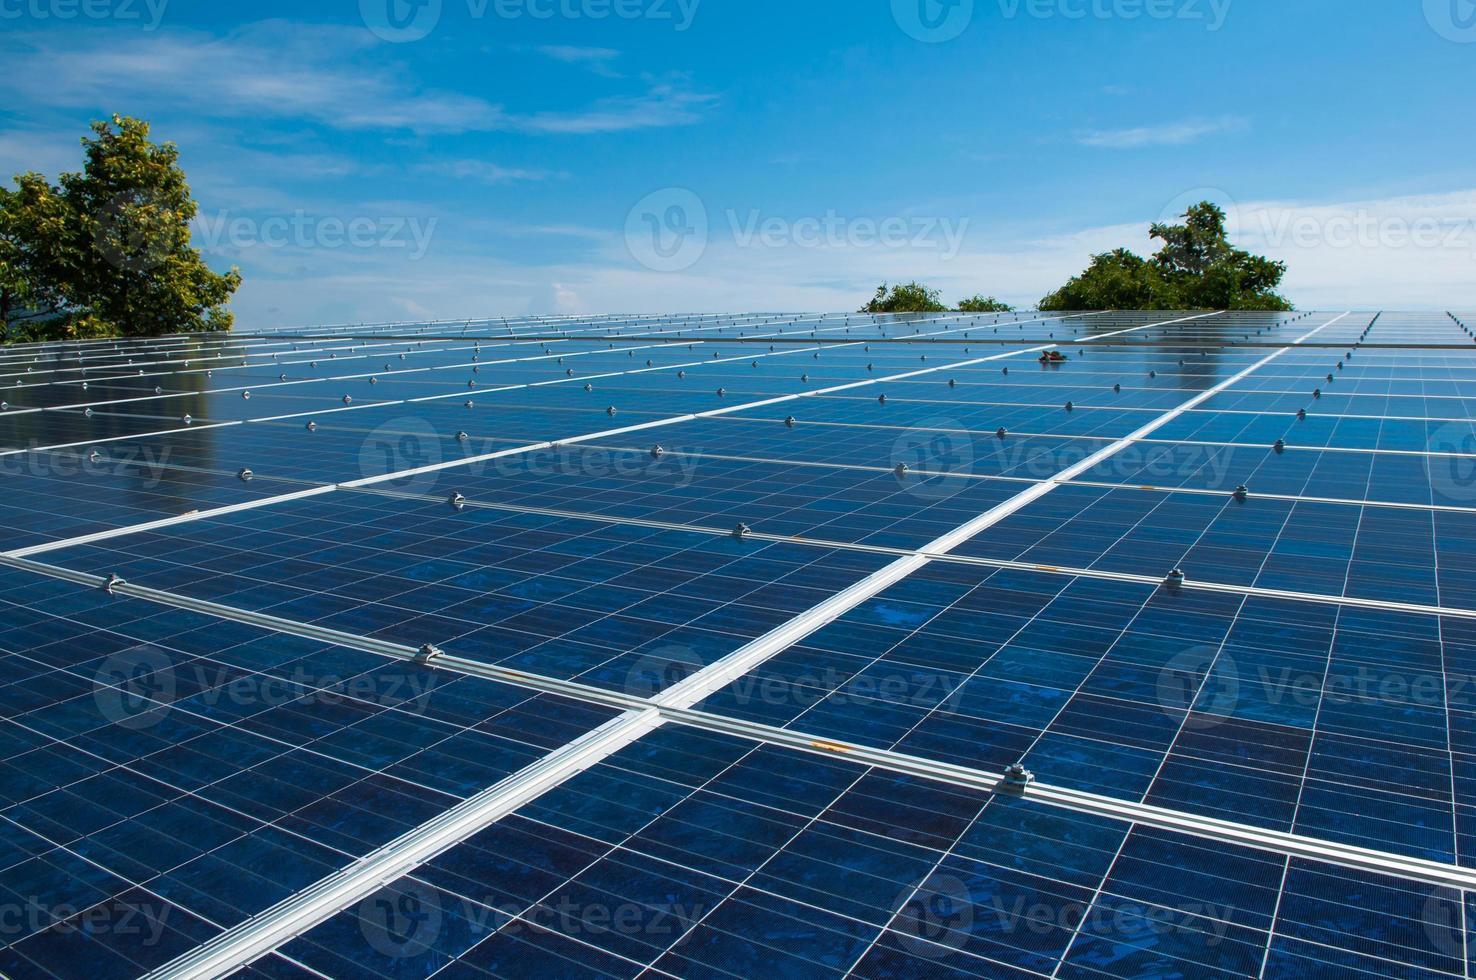 solpanel på ett livsmiljö tak foto